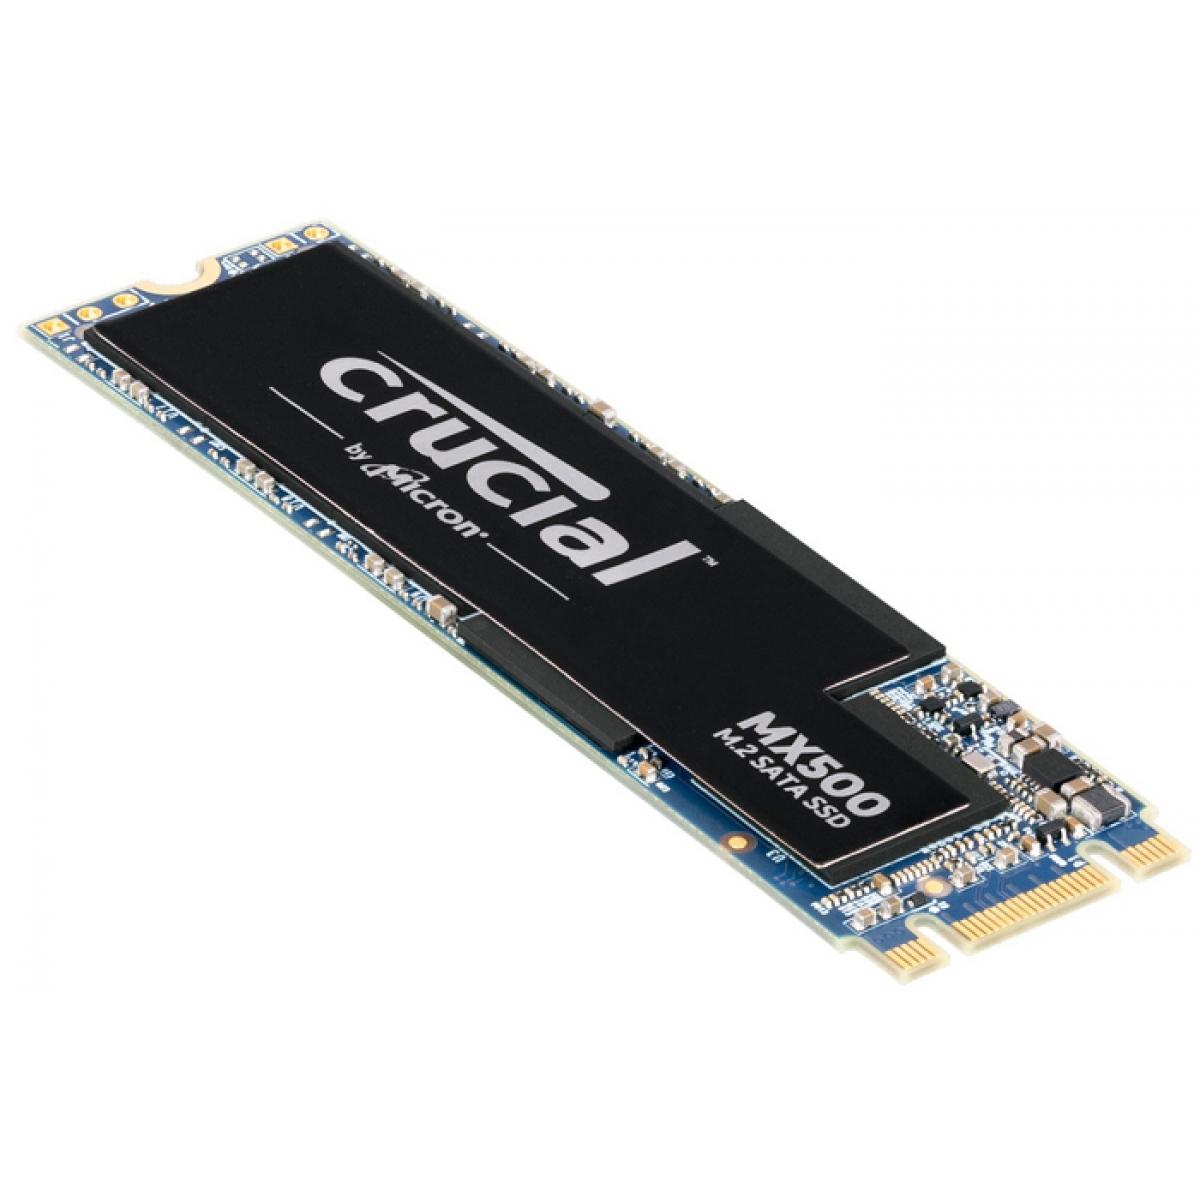 SSD Crucial MX500, 250GB, M.2 2280, Sata, Leitura 560MBs Gravação 510MBs, CT250MX500SSD4